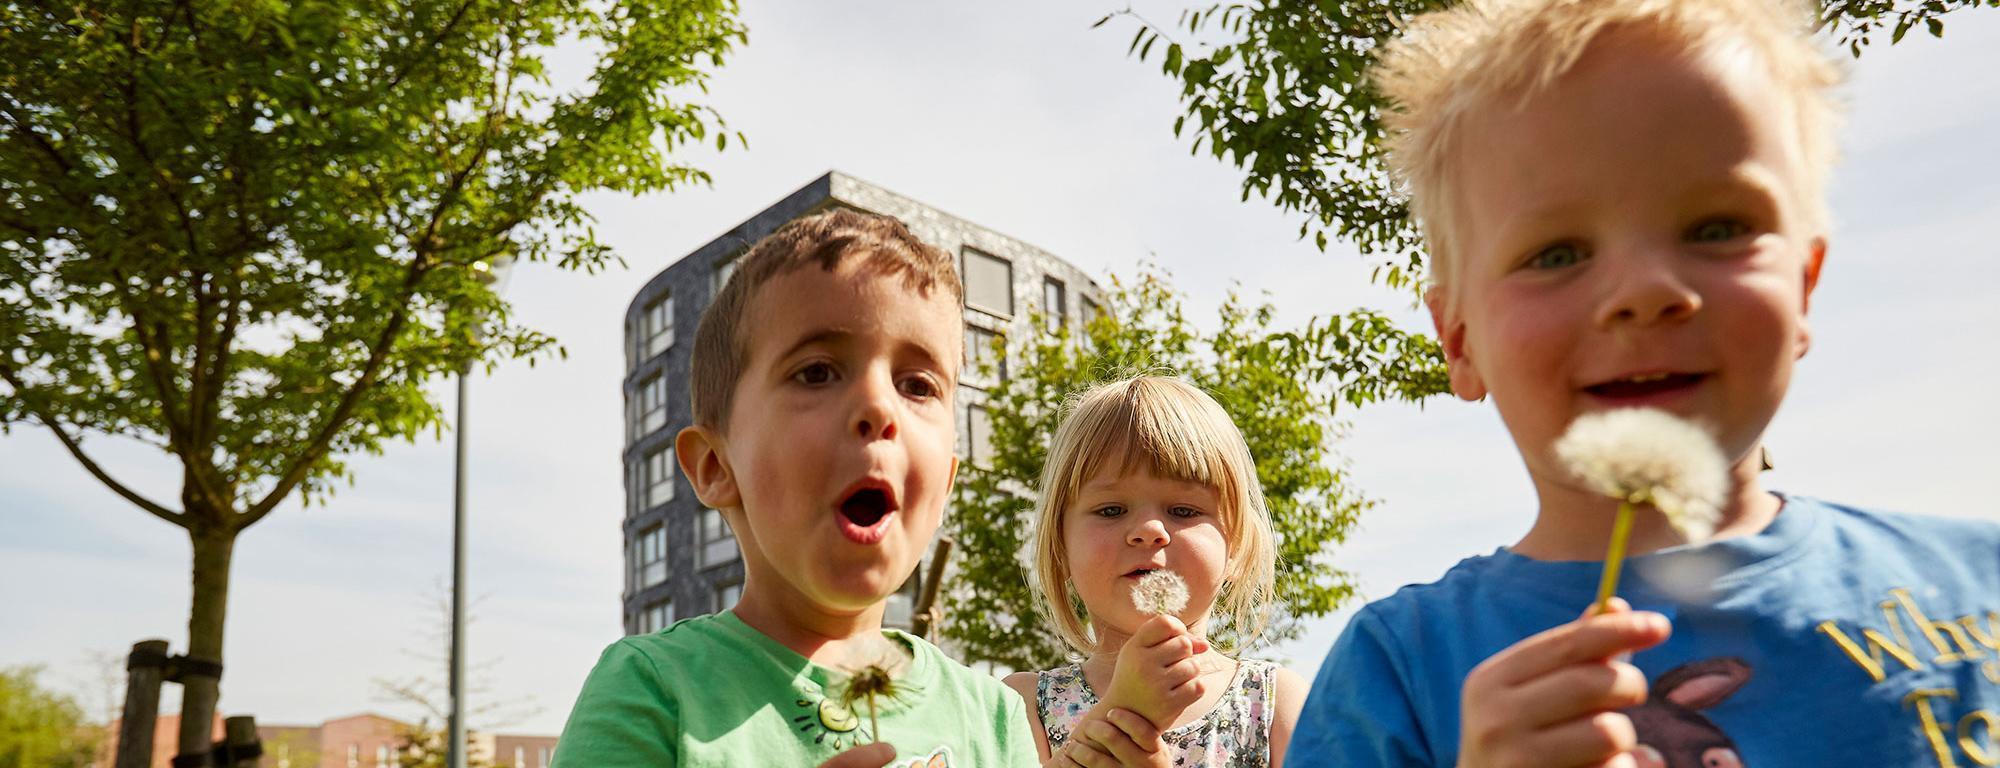 kinderopvang-KION-kinderopvang-Nijmegen